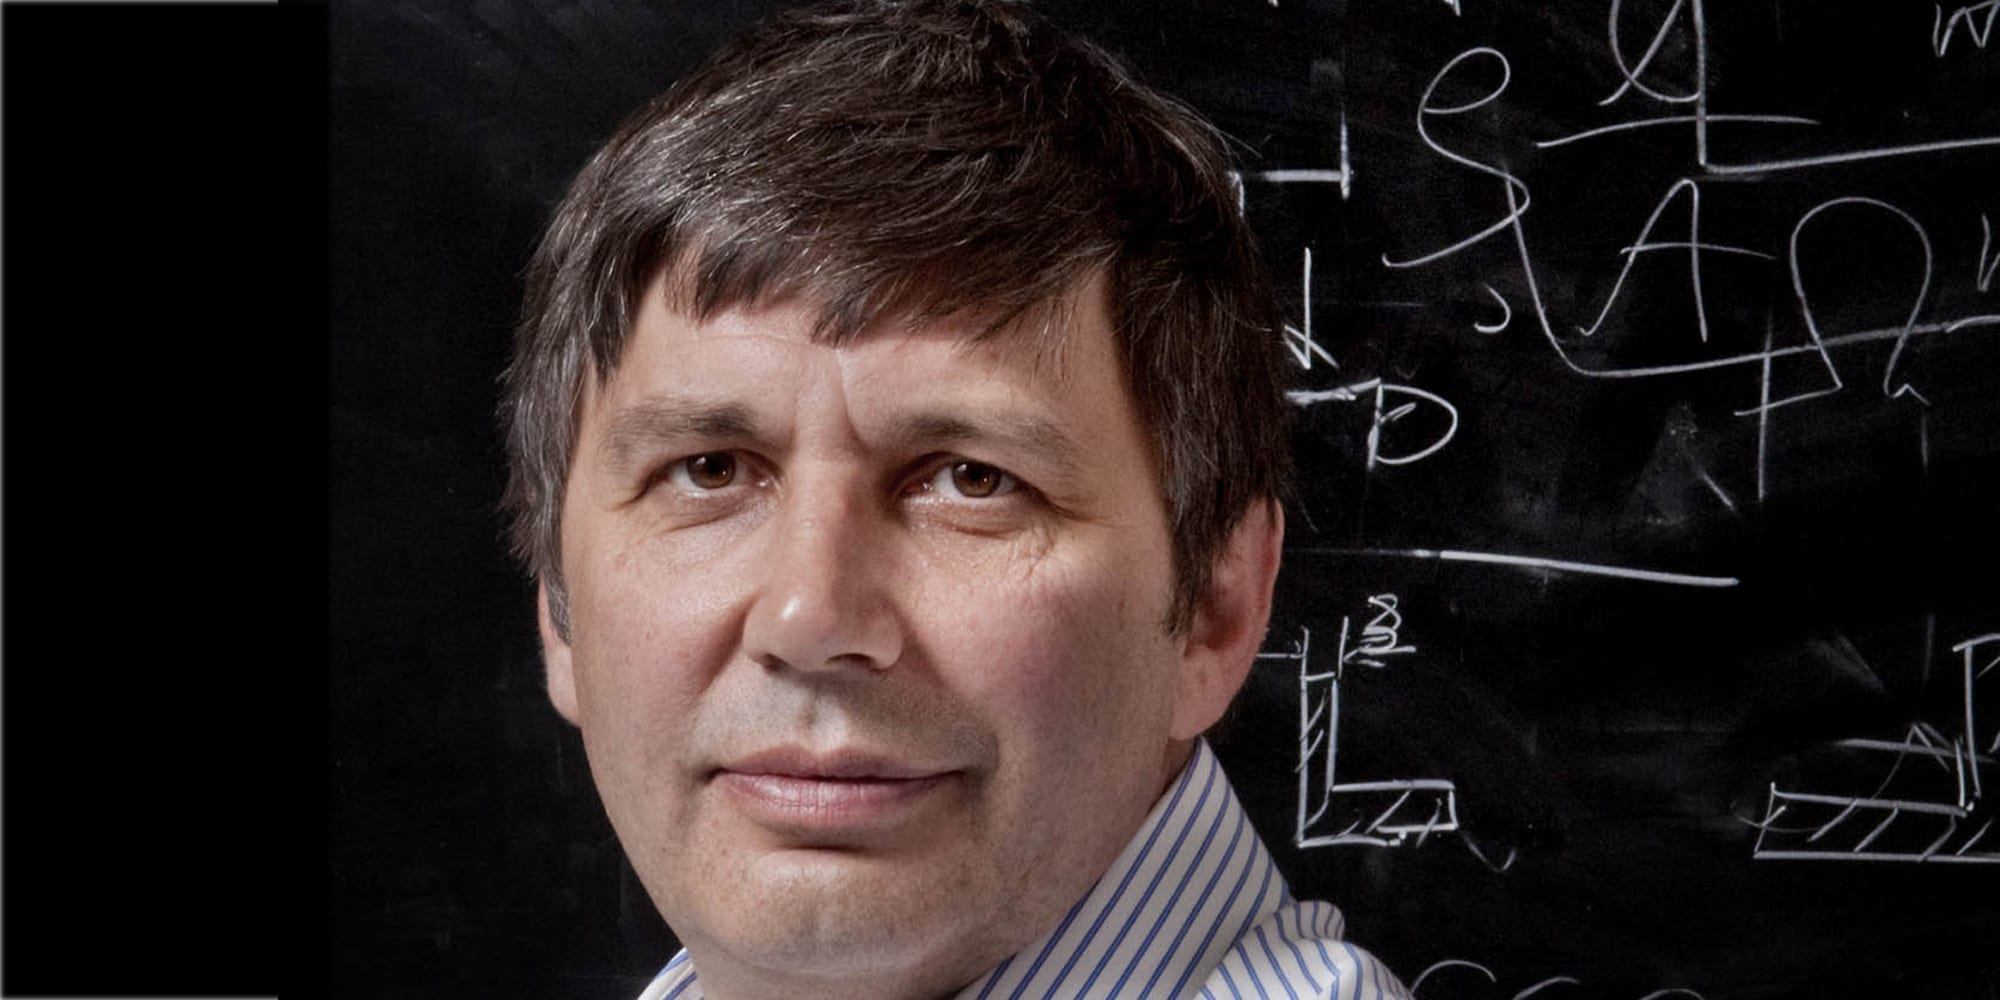 Andre Geim Graphene Revolution 52 Insights